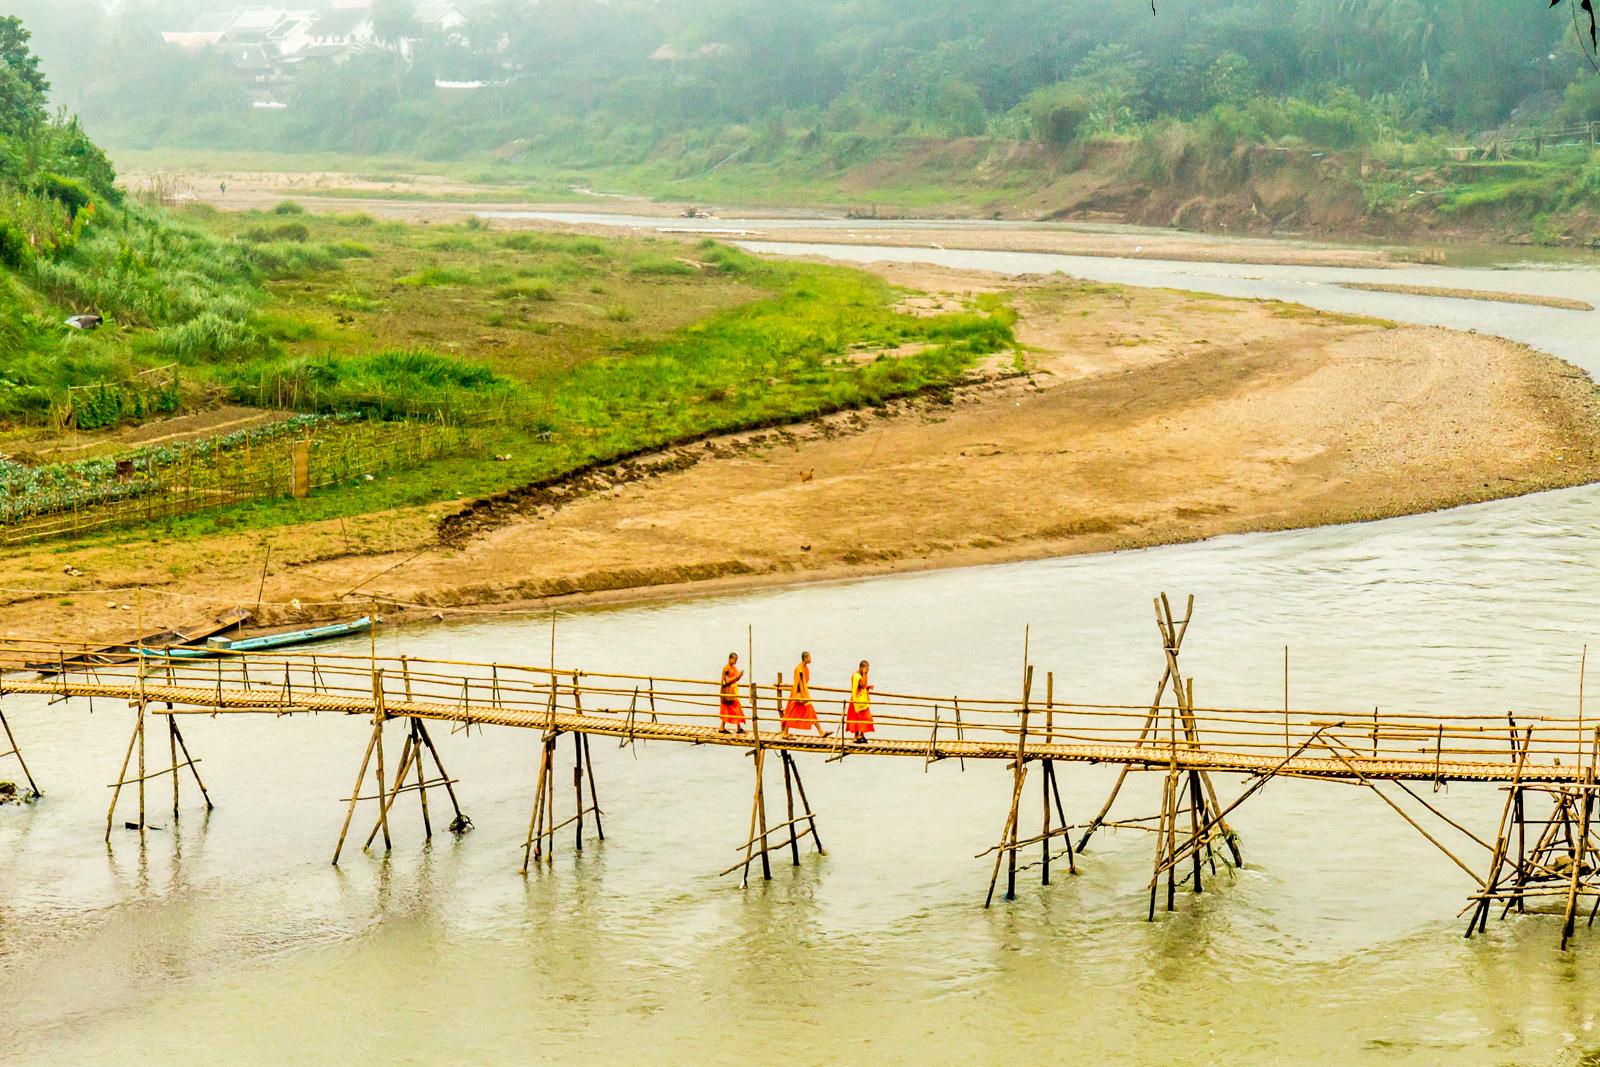 Monks crossing the bamboo bridge.